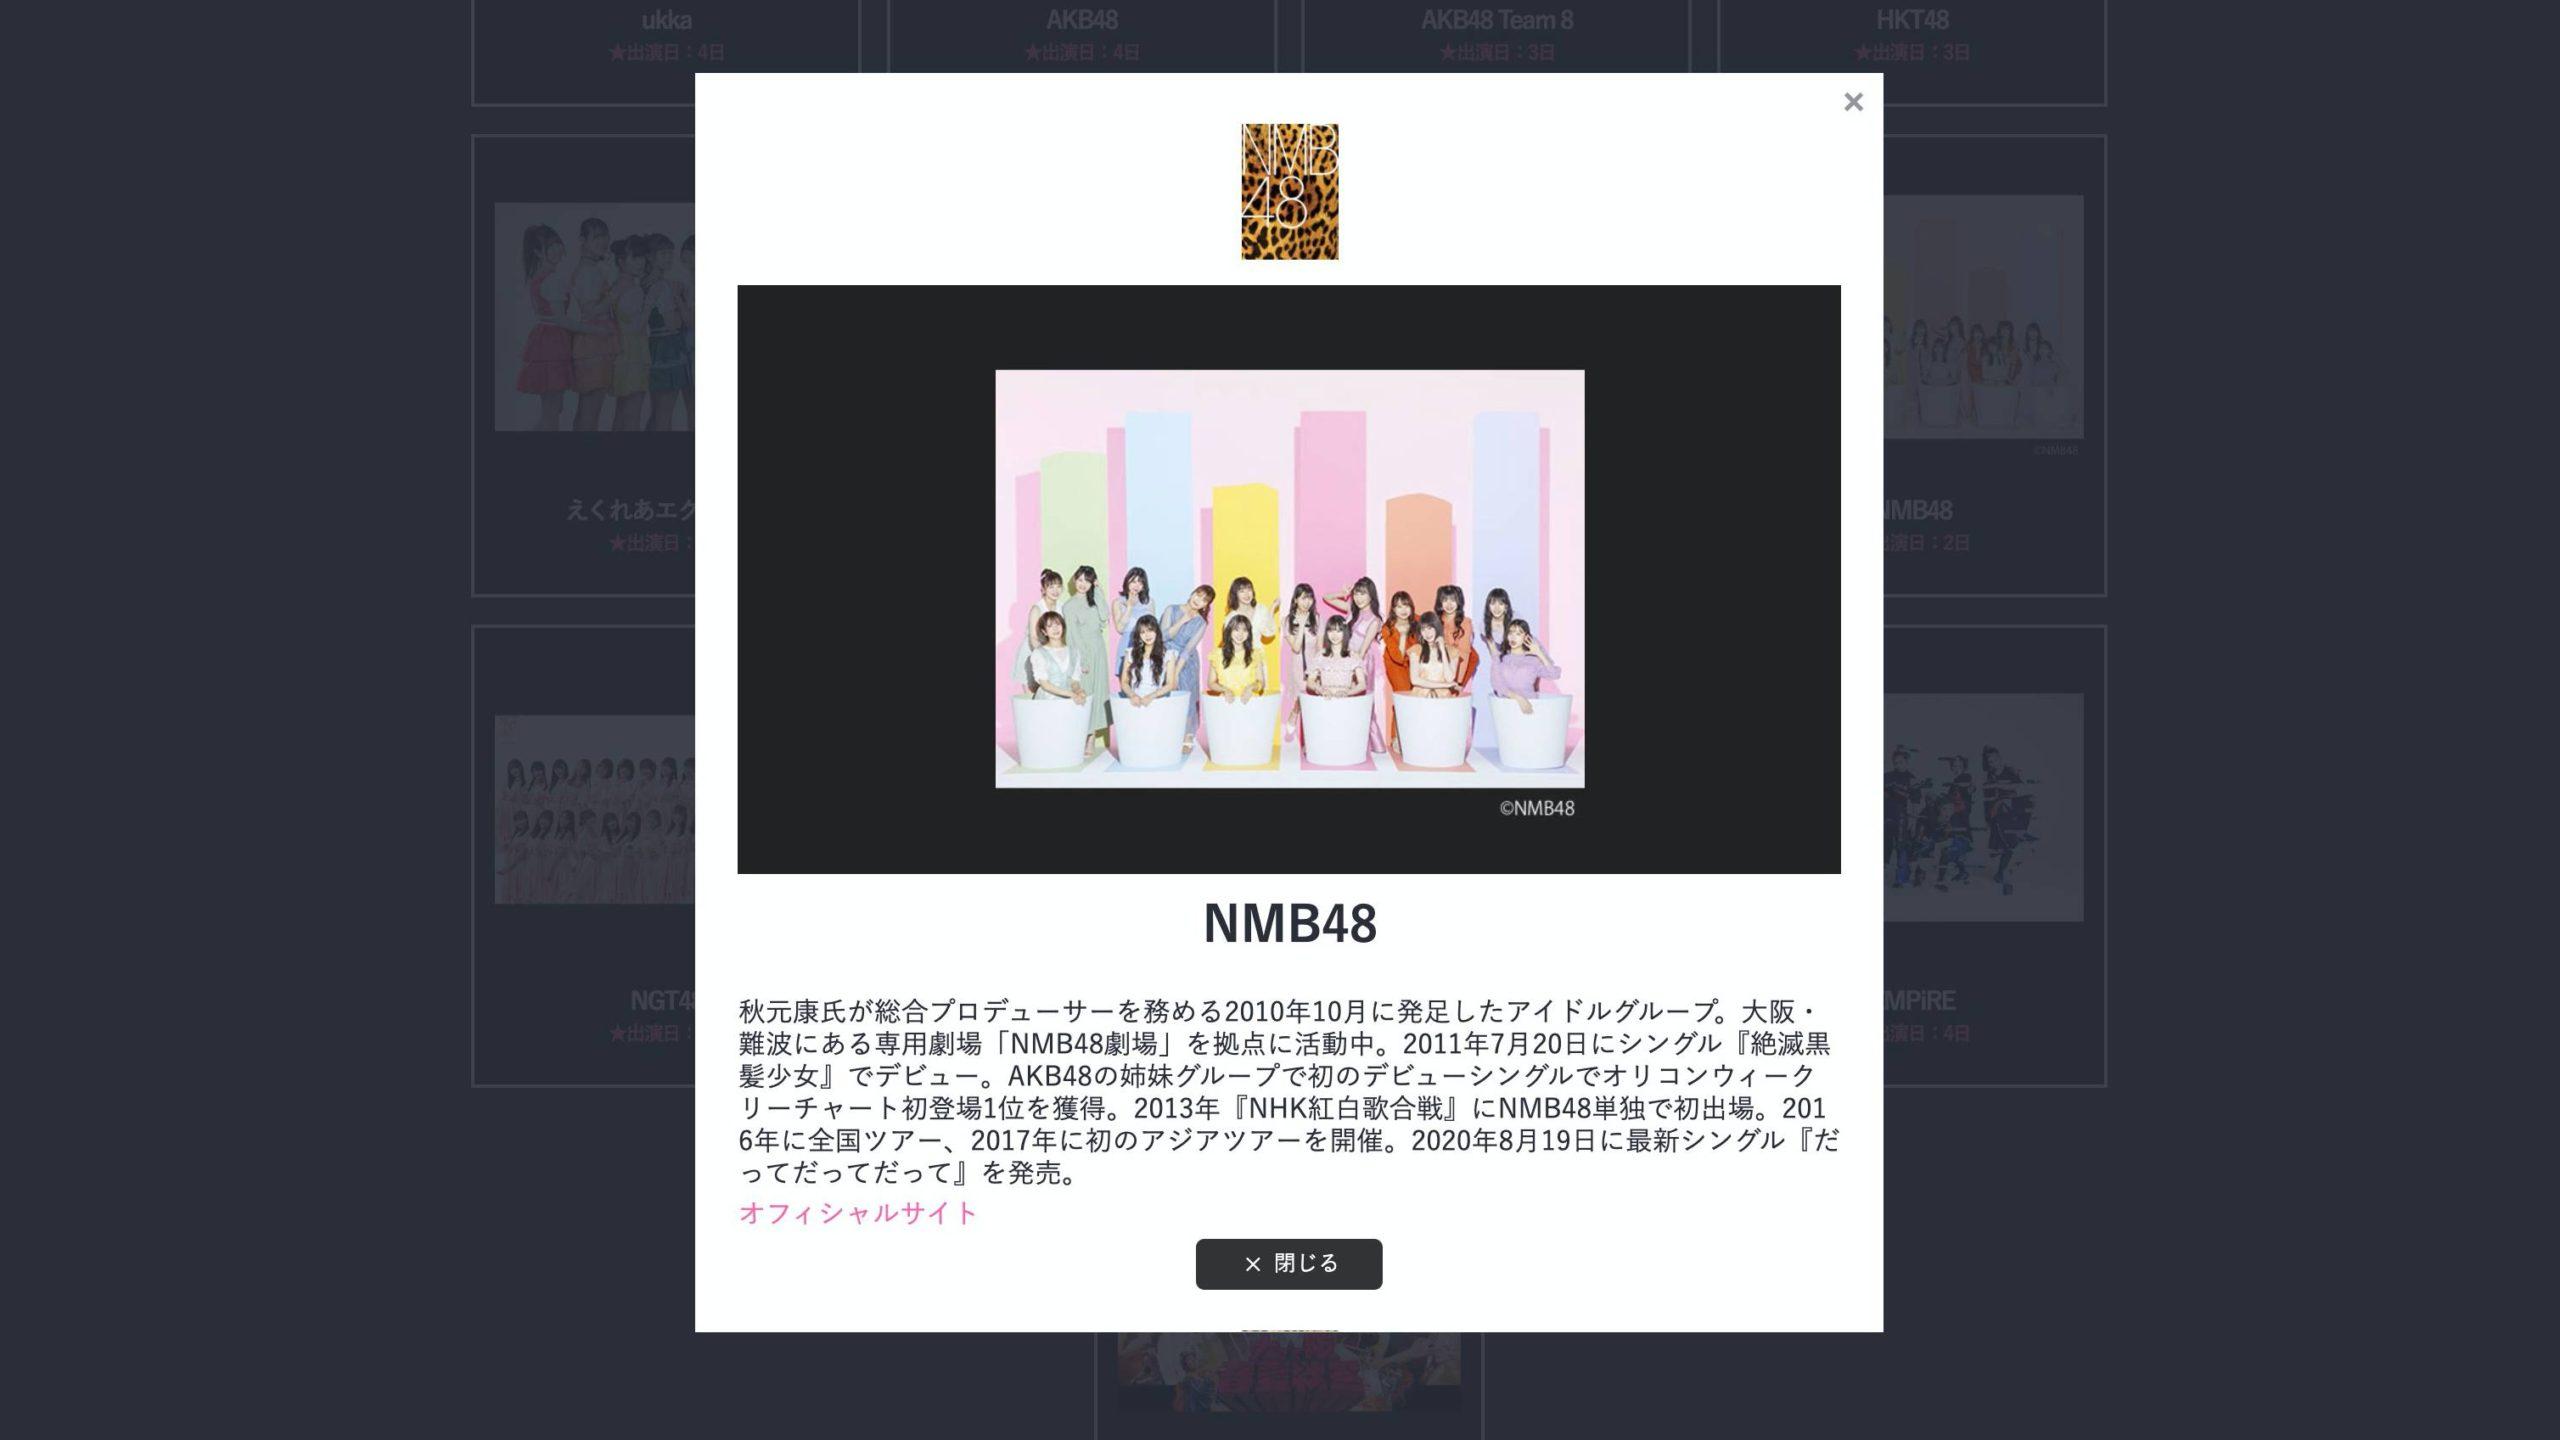 【NMB48】TOKYO IDOL FESTIVAL オンライン2020の出演メンバーが発表